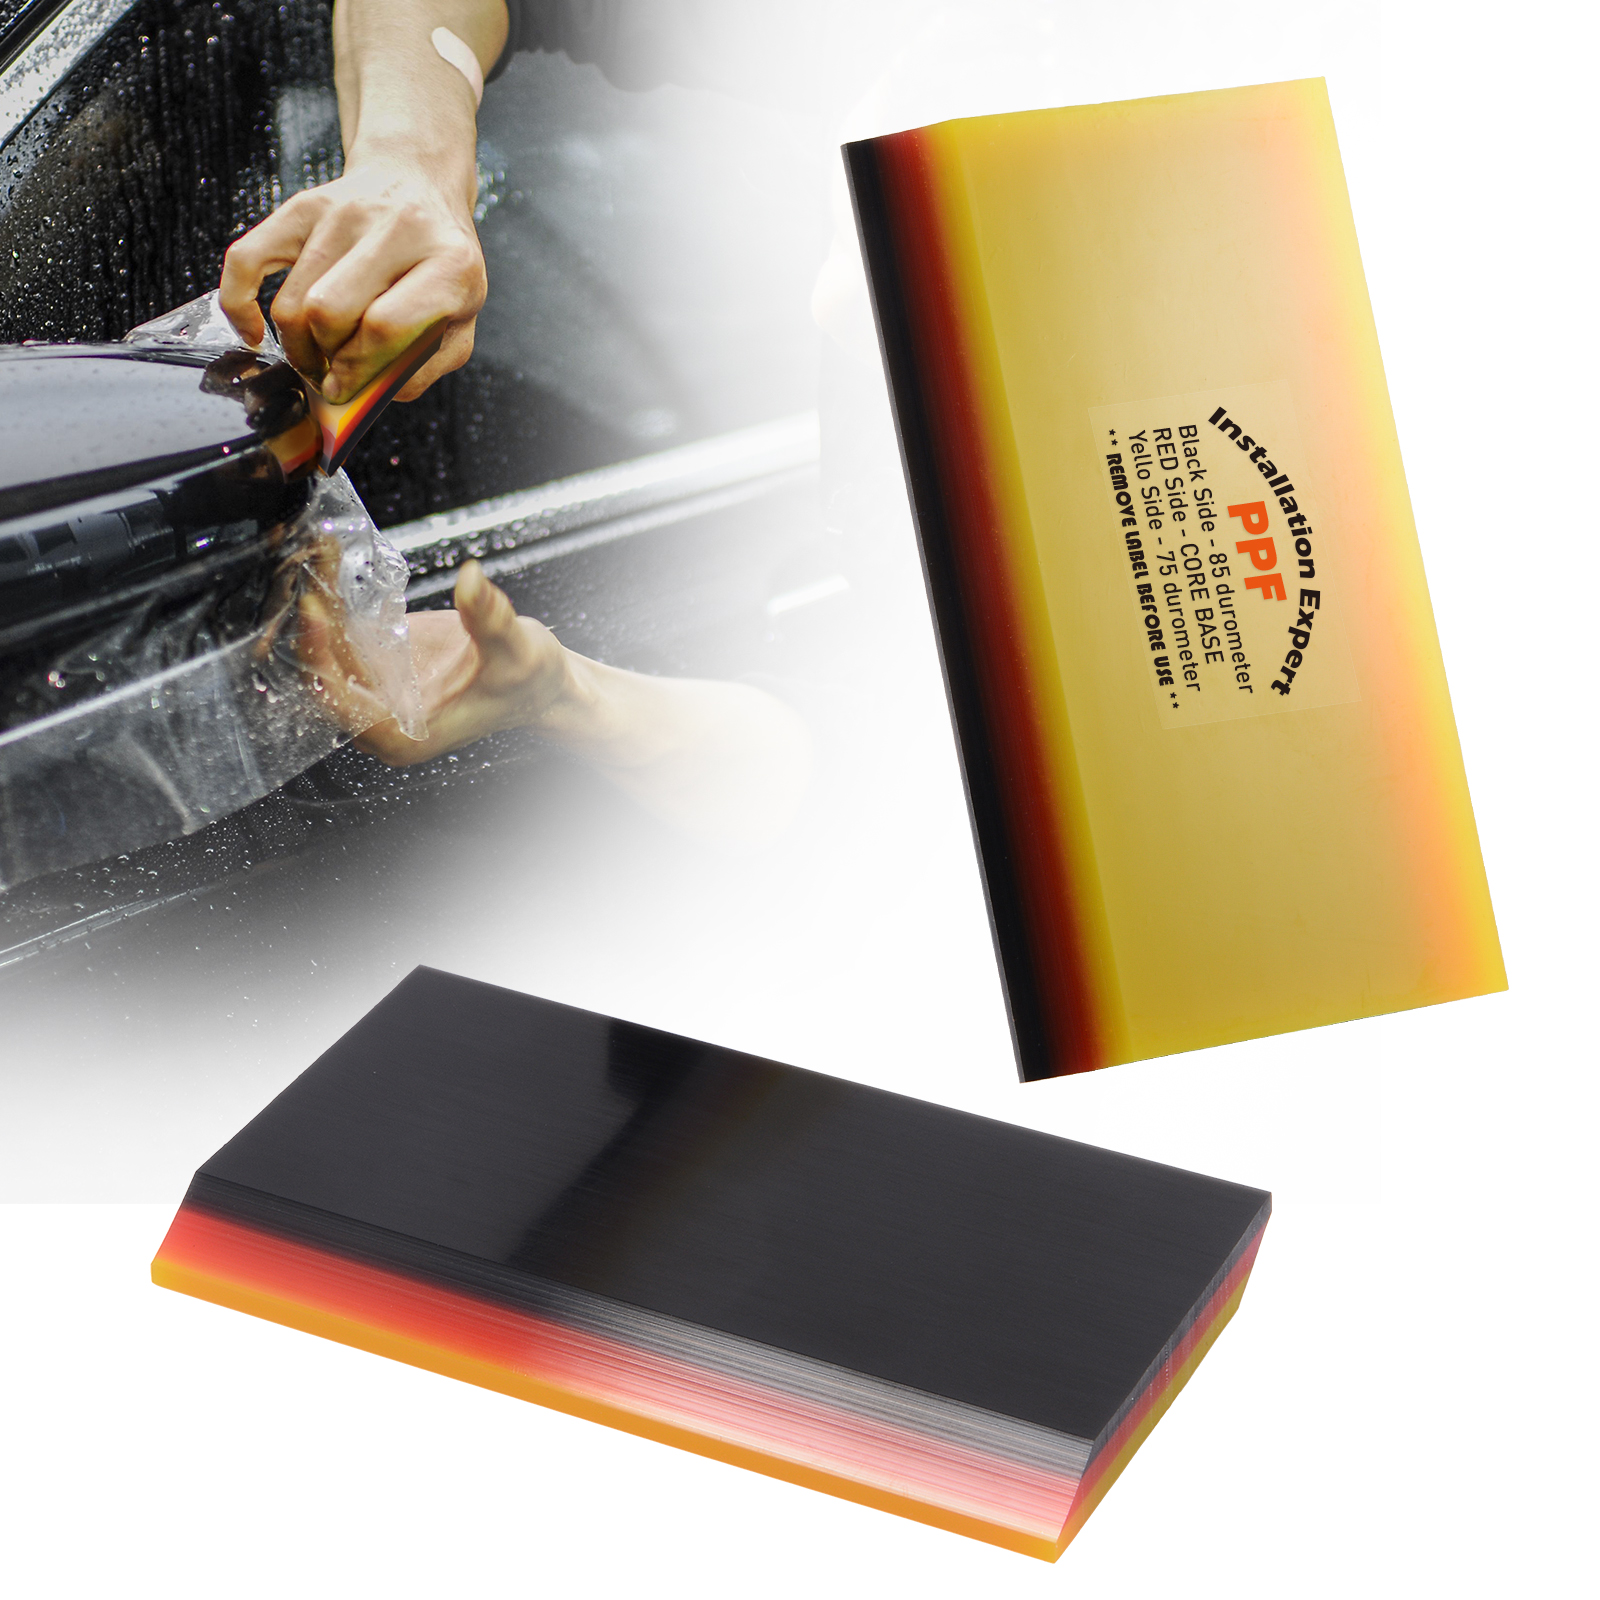 FOSHIO 3 Layer Soft Squeegee Carbon Fiber Sticker Remover Car Wrap Vinyl Film Install 2in1 Scraper Window Tint Car Cleaning Tool